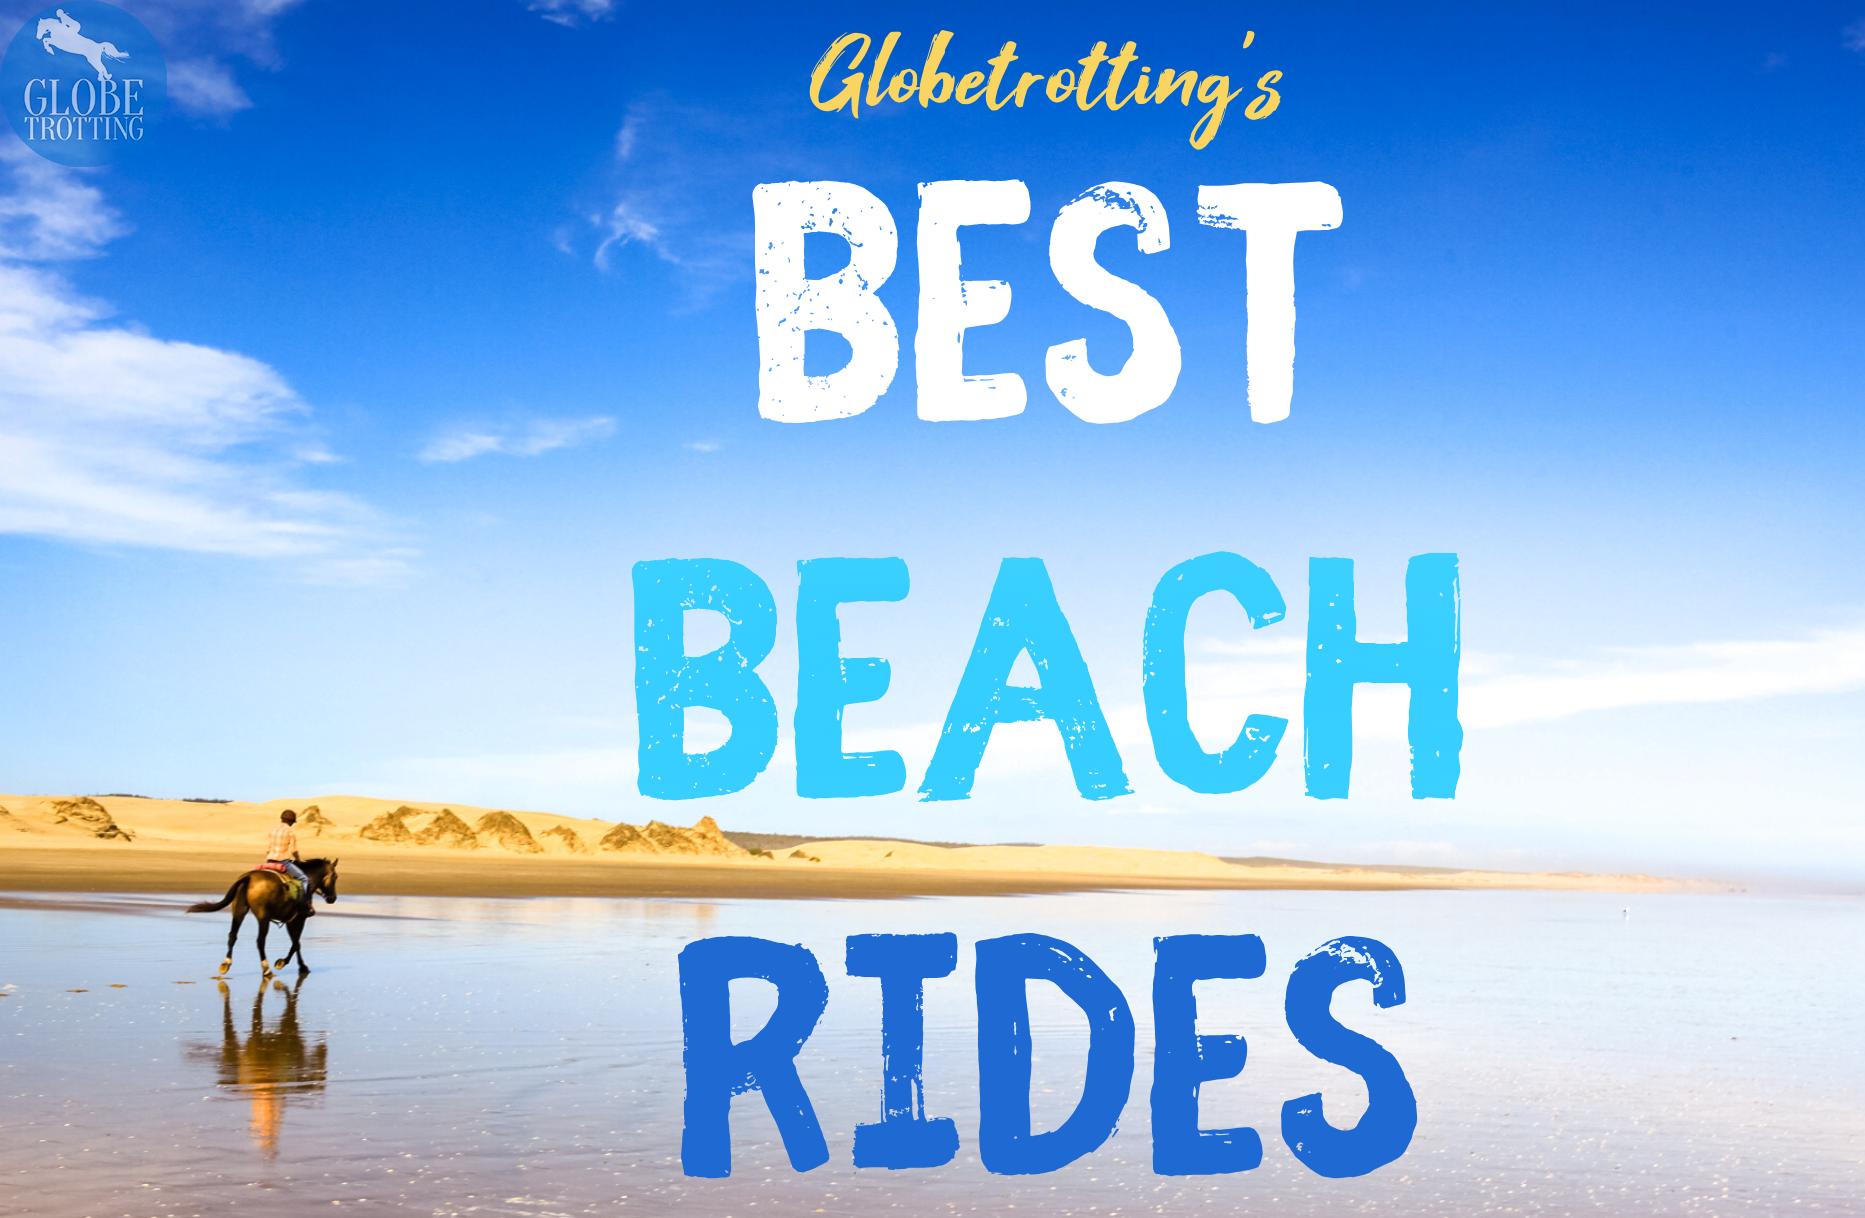 Globetrotting's Best Beach Rides - Globetrotting horse riding holidays